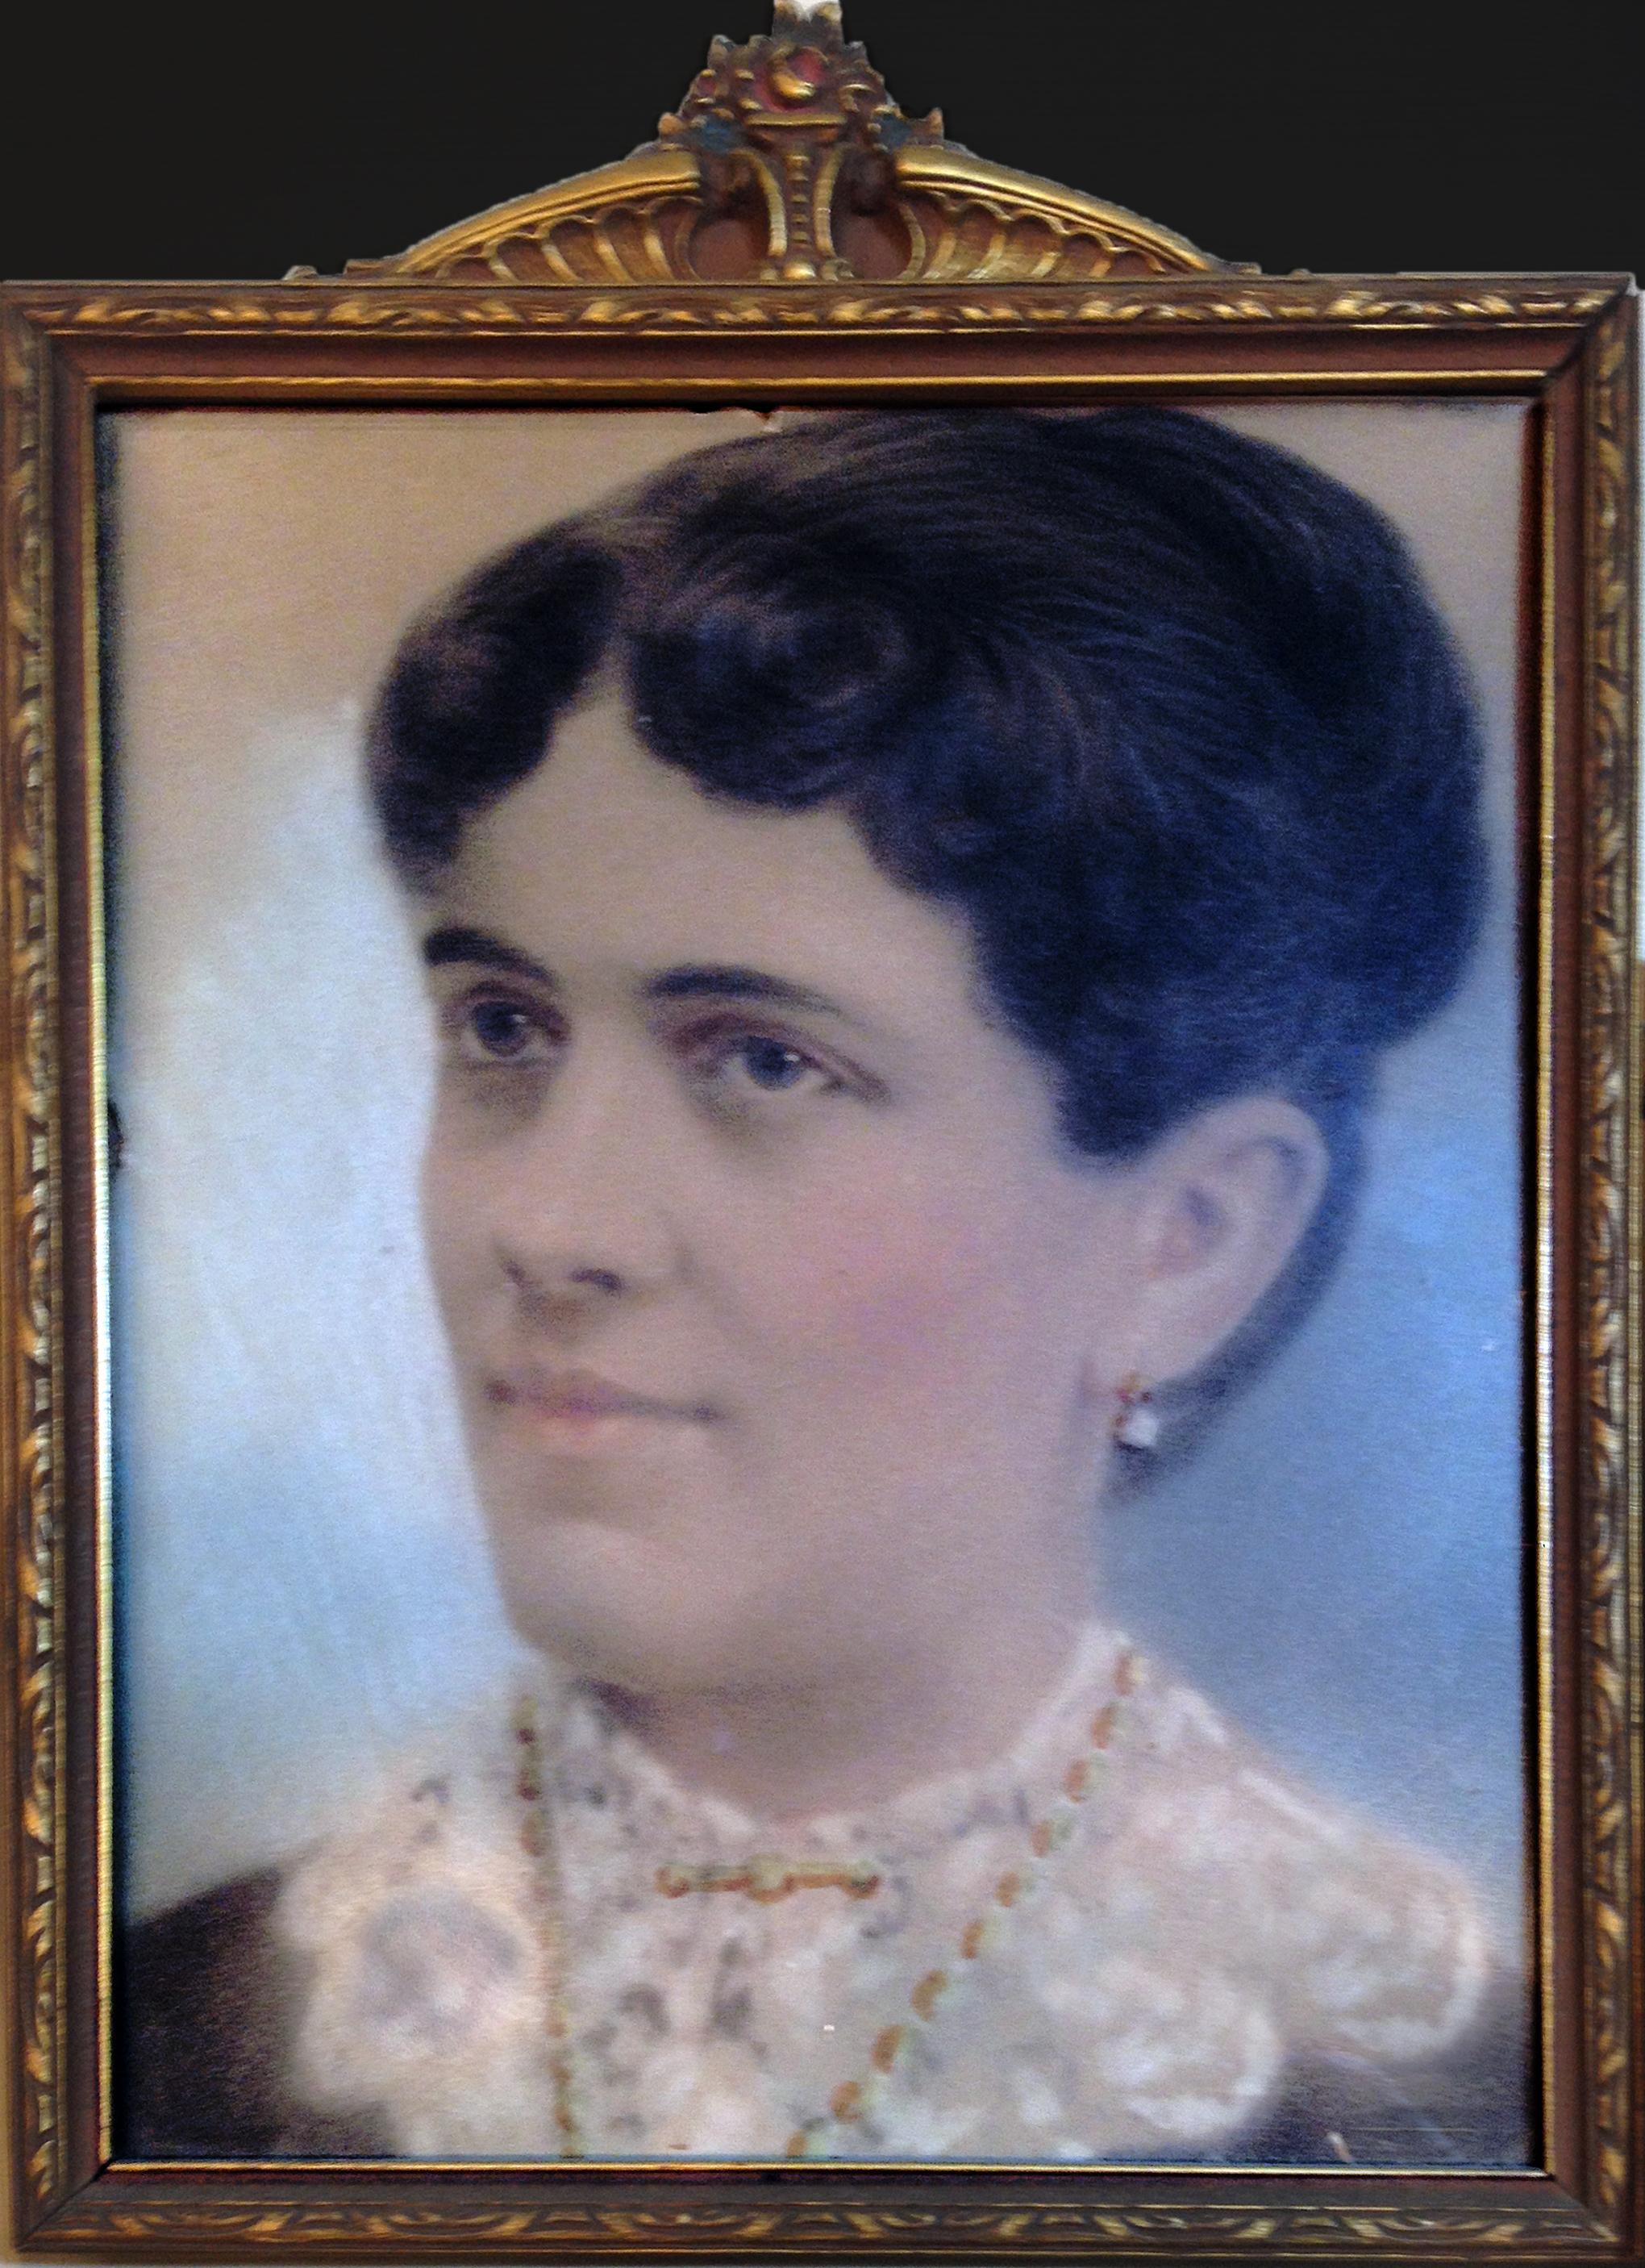 Sophia Schmitt